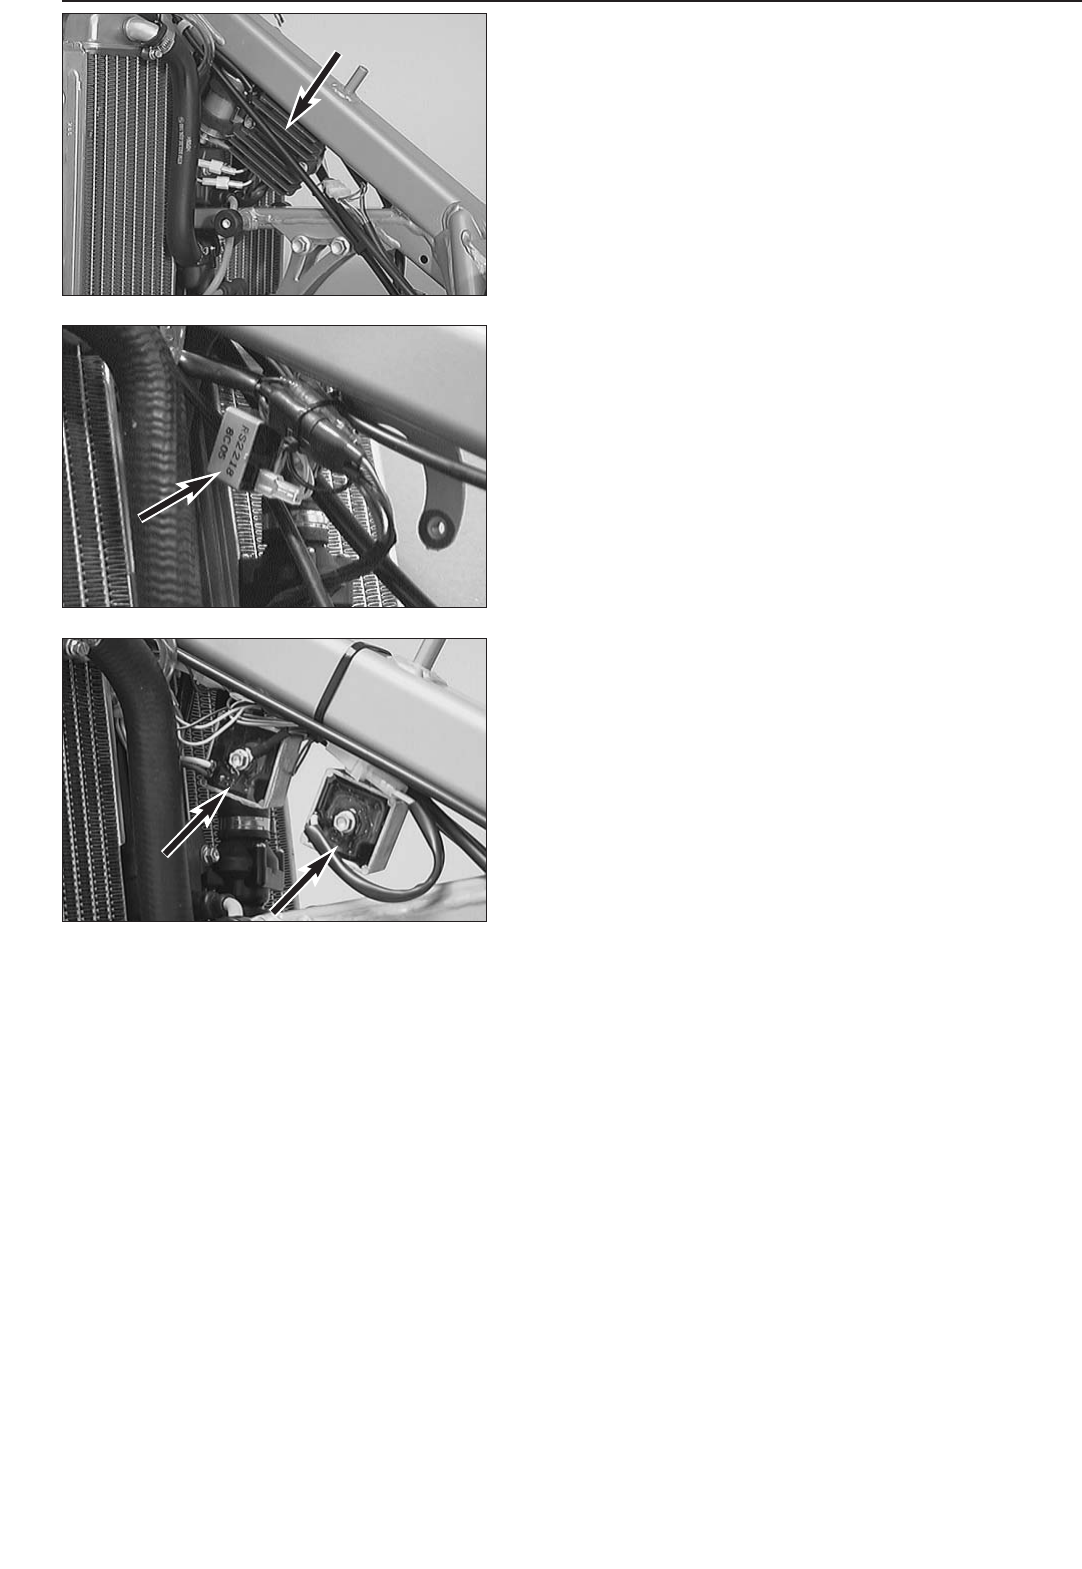 2003 Ktm Wiring Diagram